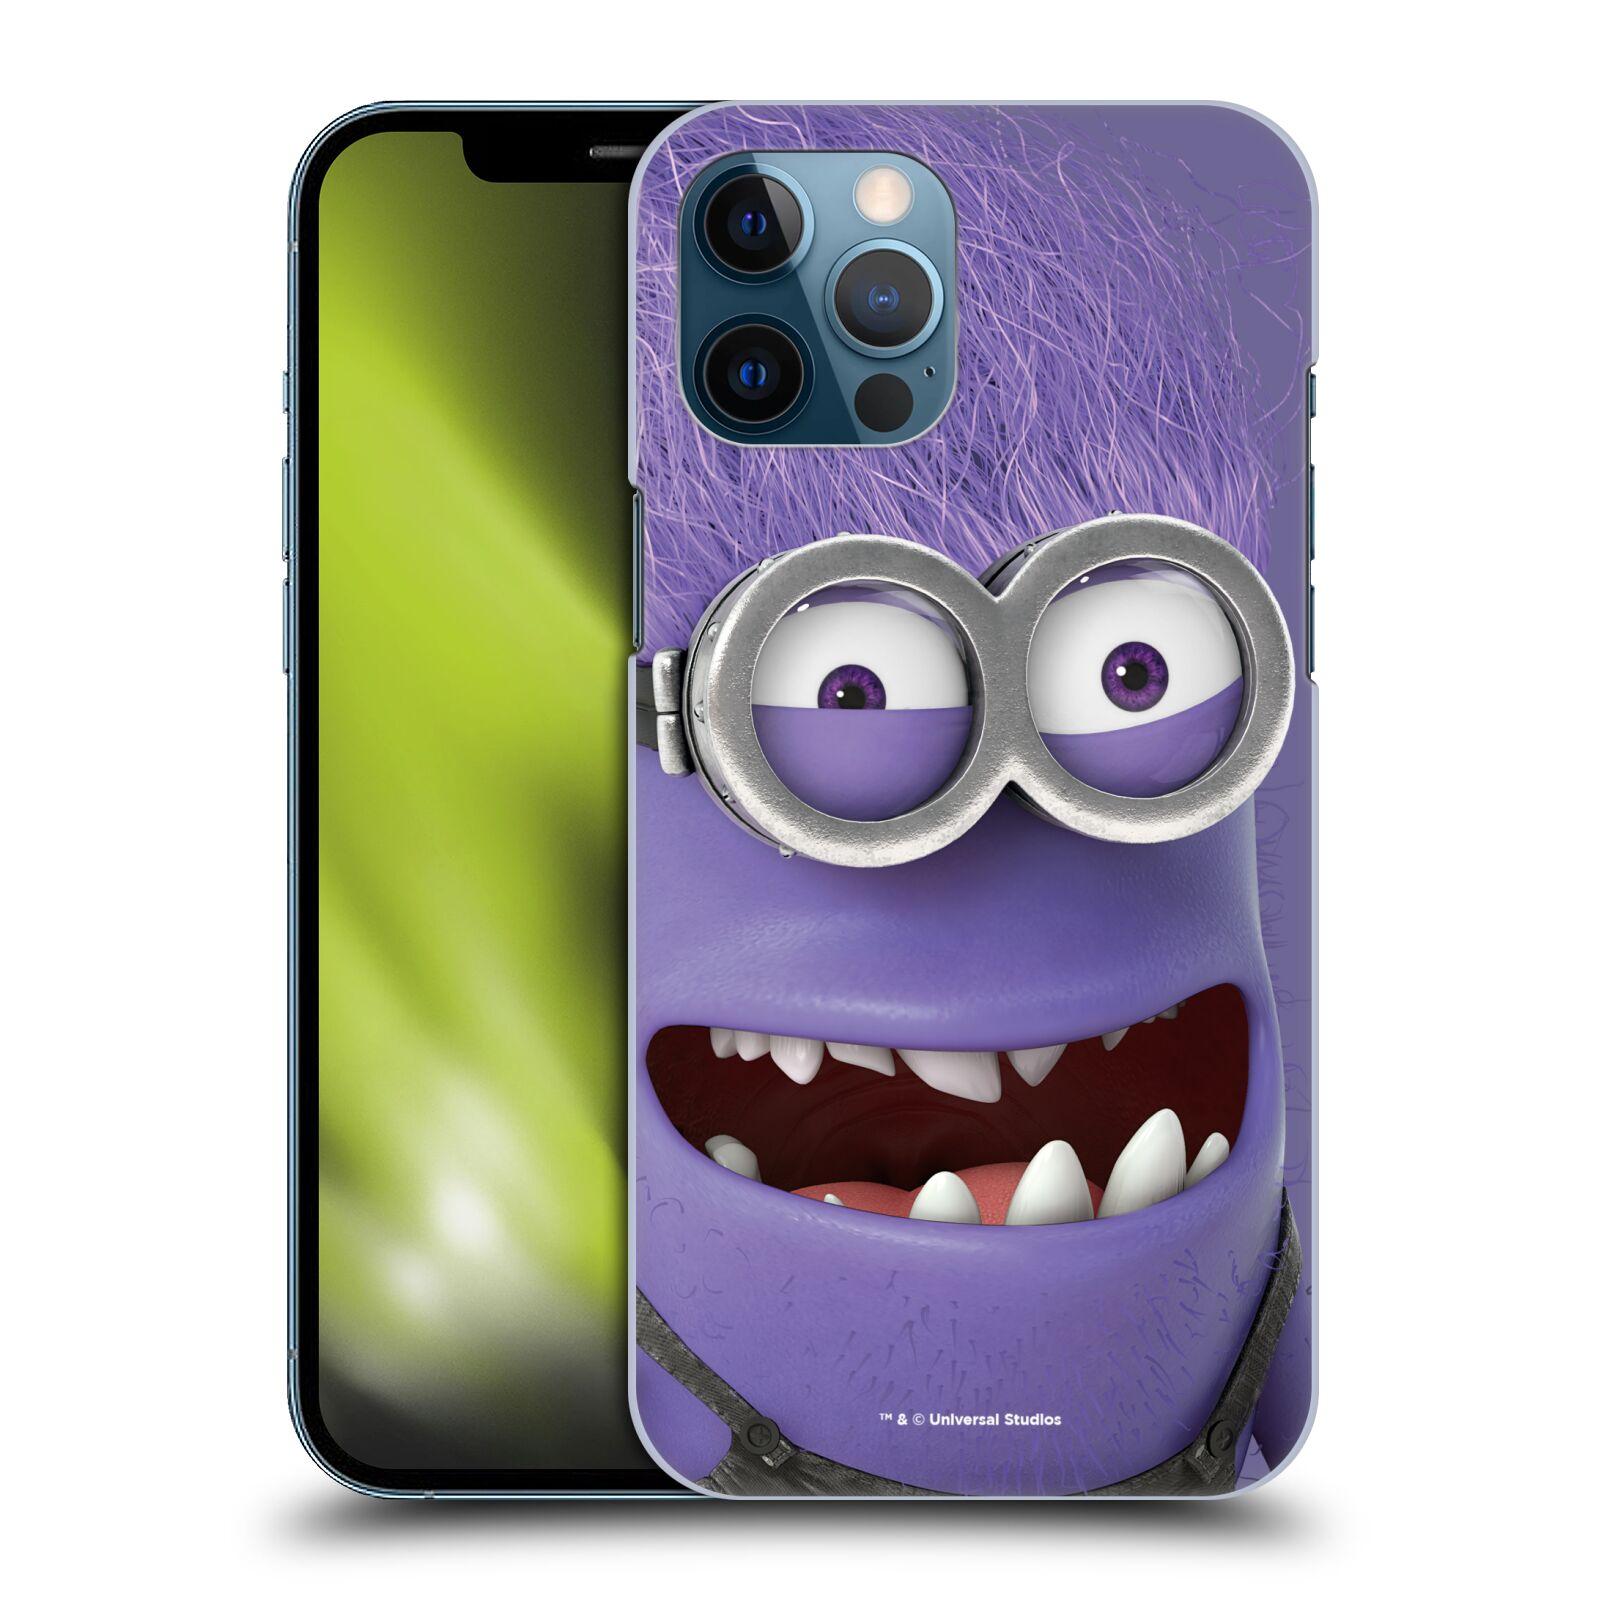 Plastové pouzdro na mobil Apple iPhone 12 Pro Max - Head Case - Zlý Mimoň z filmu Já, padouch - Despicable Me